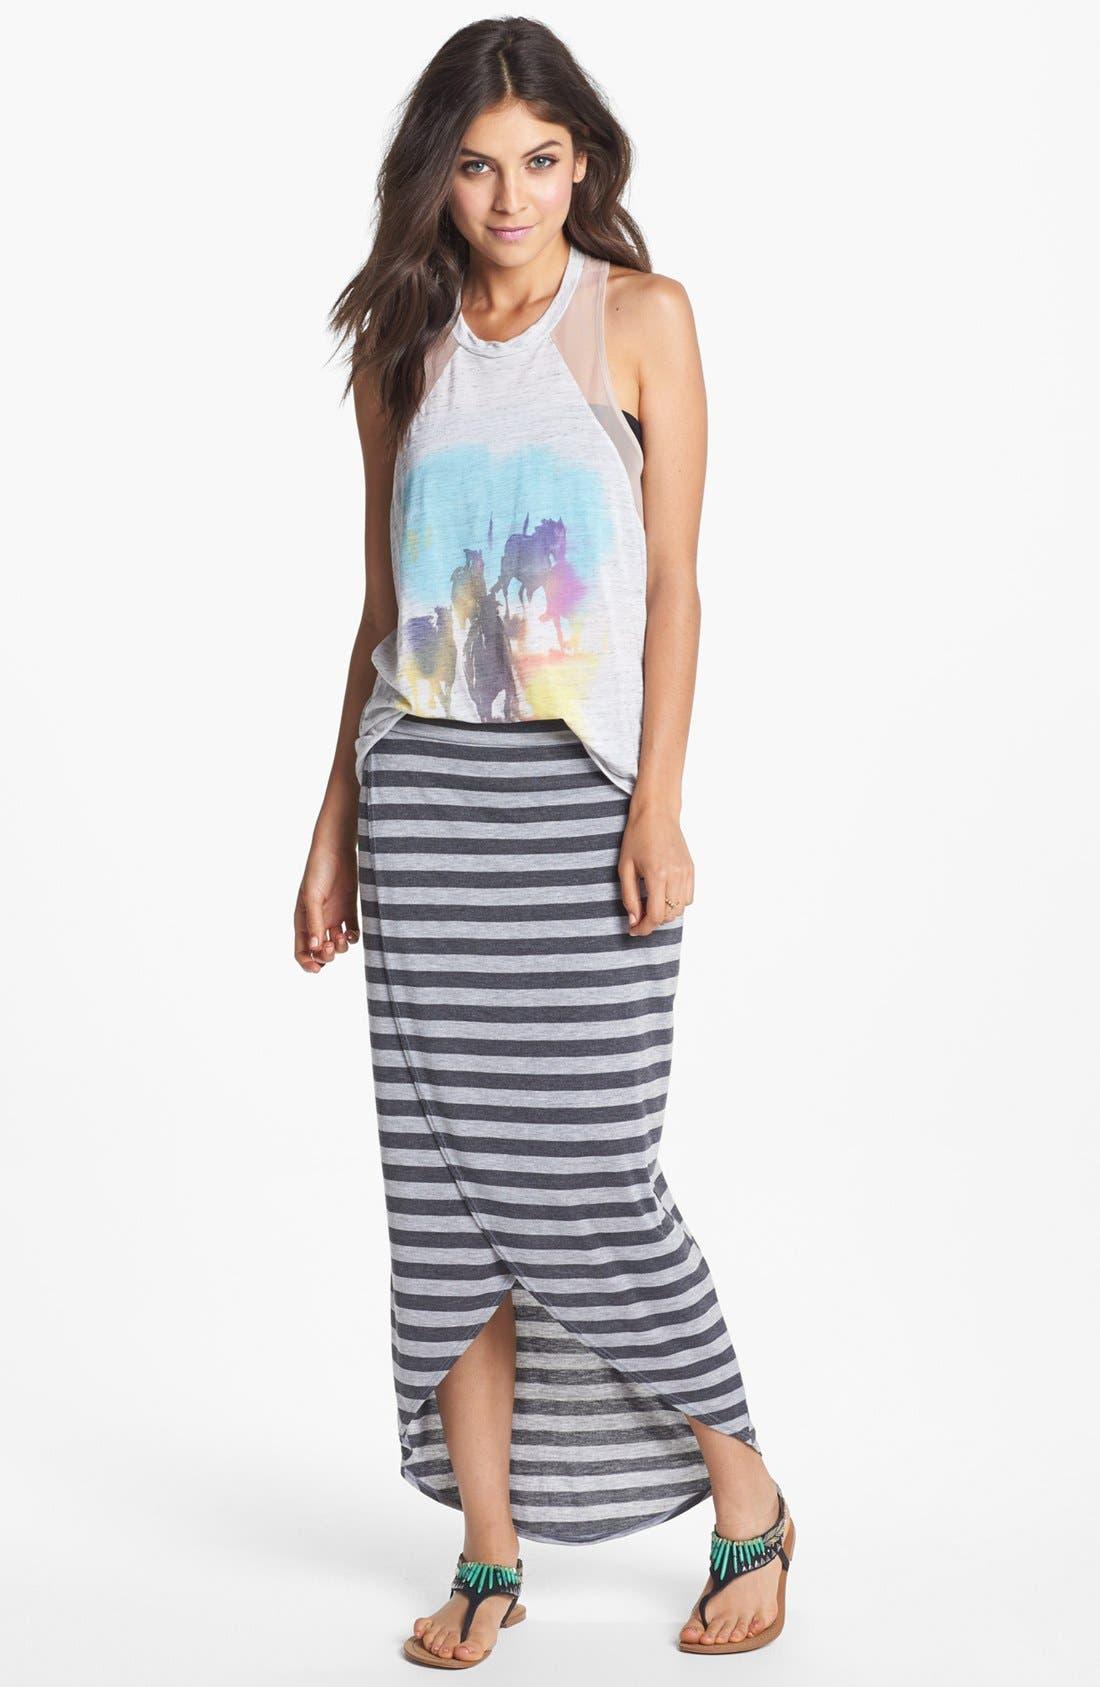 Alternate Image 1 Selected - h.i.p. High/Low Stripe Wrap Skirt (Juniors)